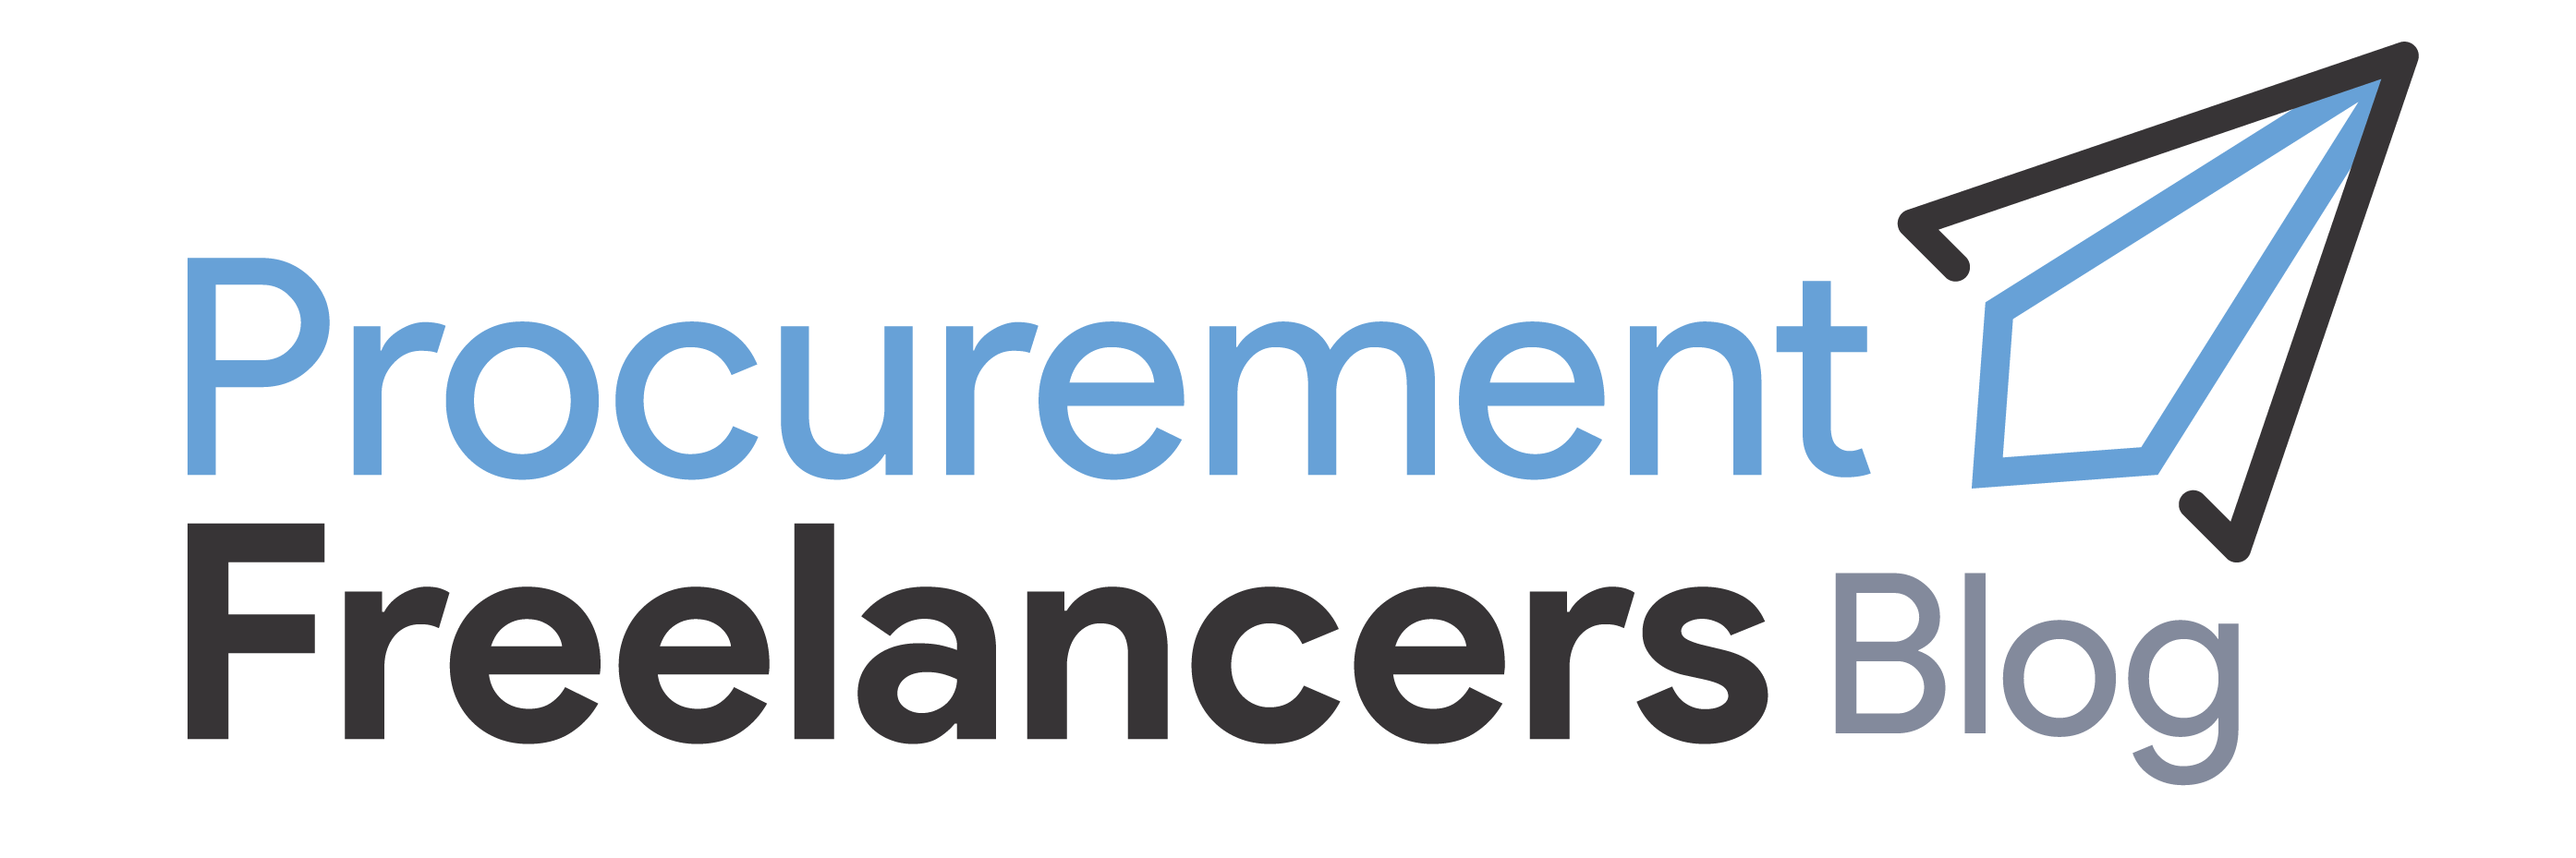 Procurement Blog | Procurement & Supply Chain Industry news